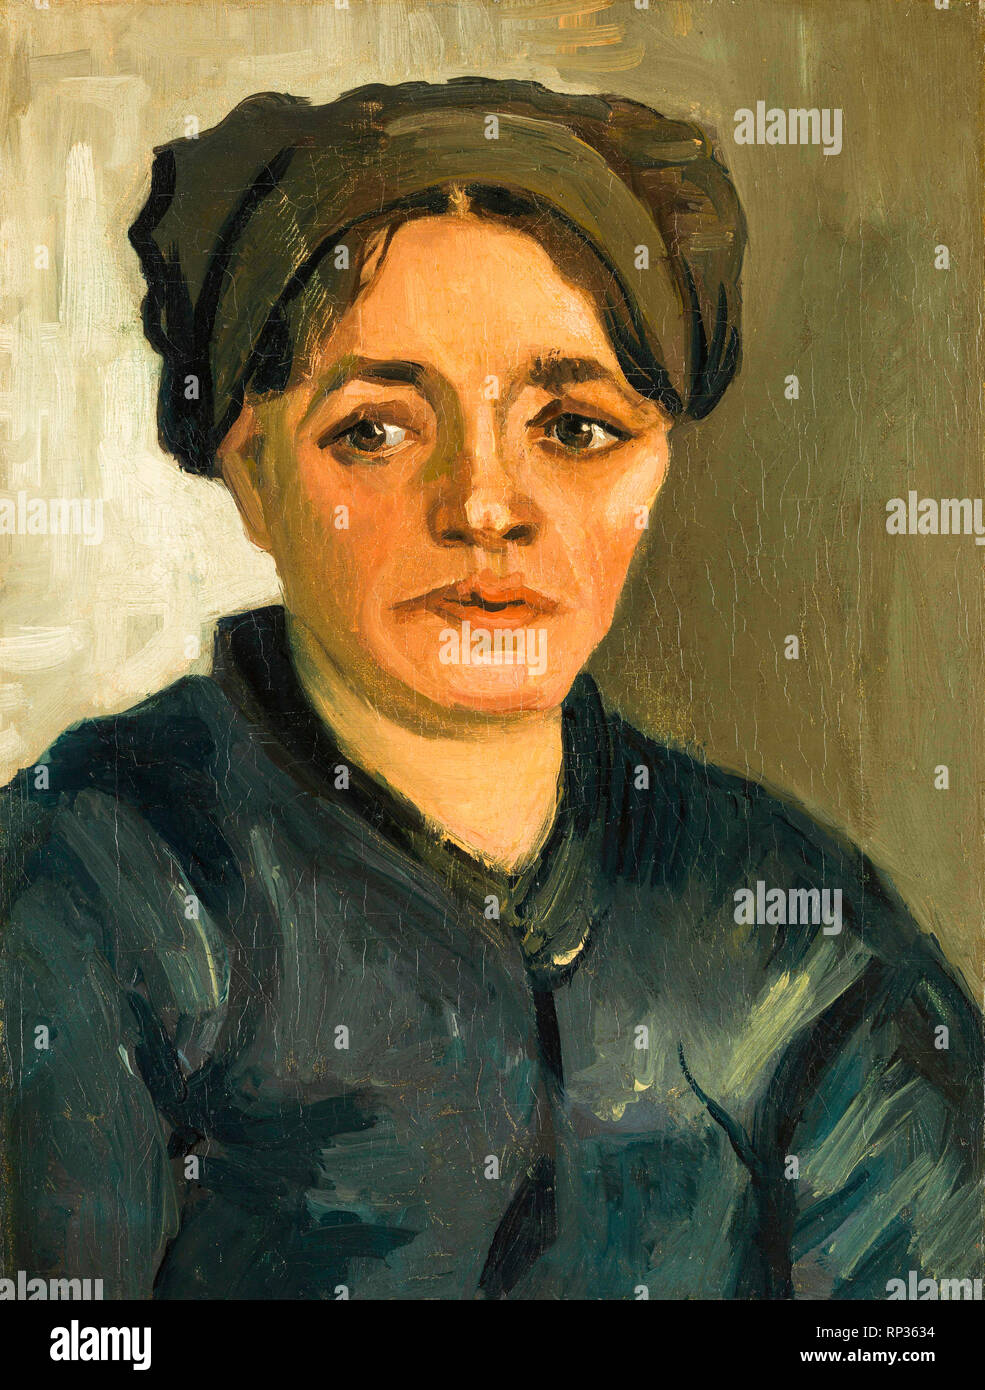 Head of a Peasant Woman, portrait, Vincent Van Gogh, 1884, painting - Stock Image